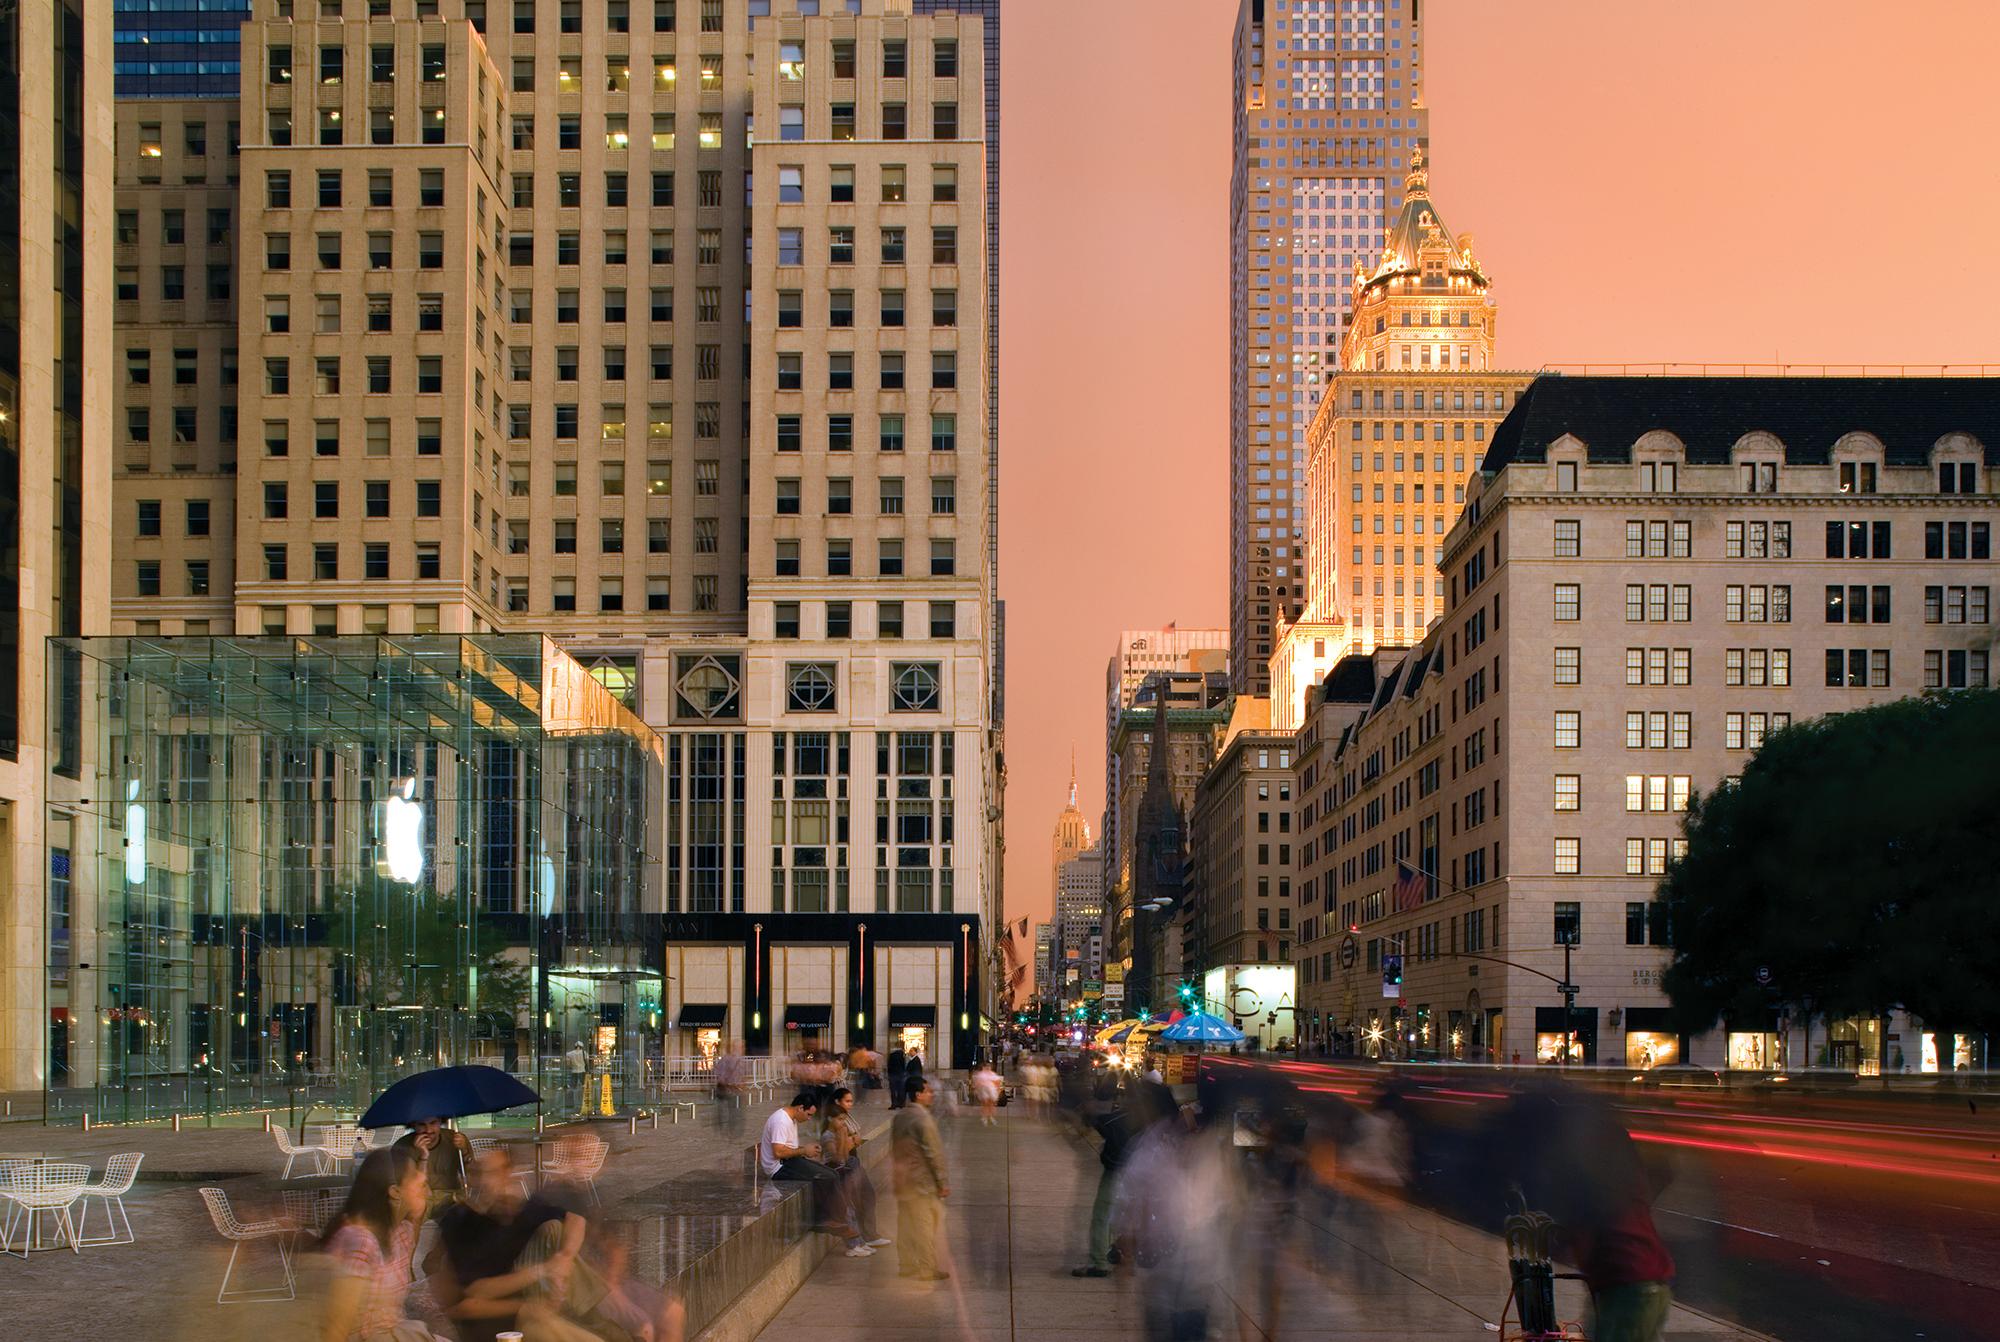 bohlin cywinski jackson | apple 5th avenue | new york usa